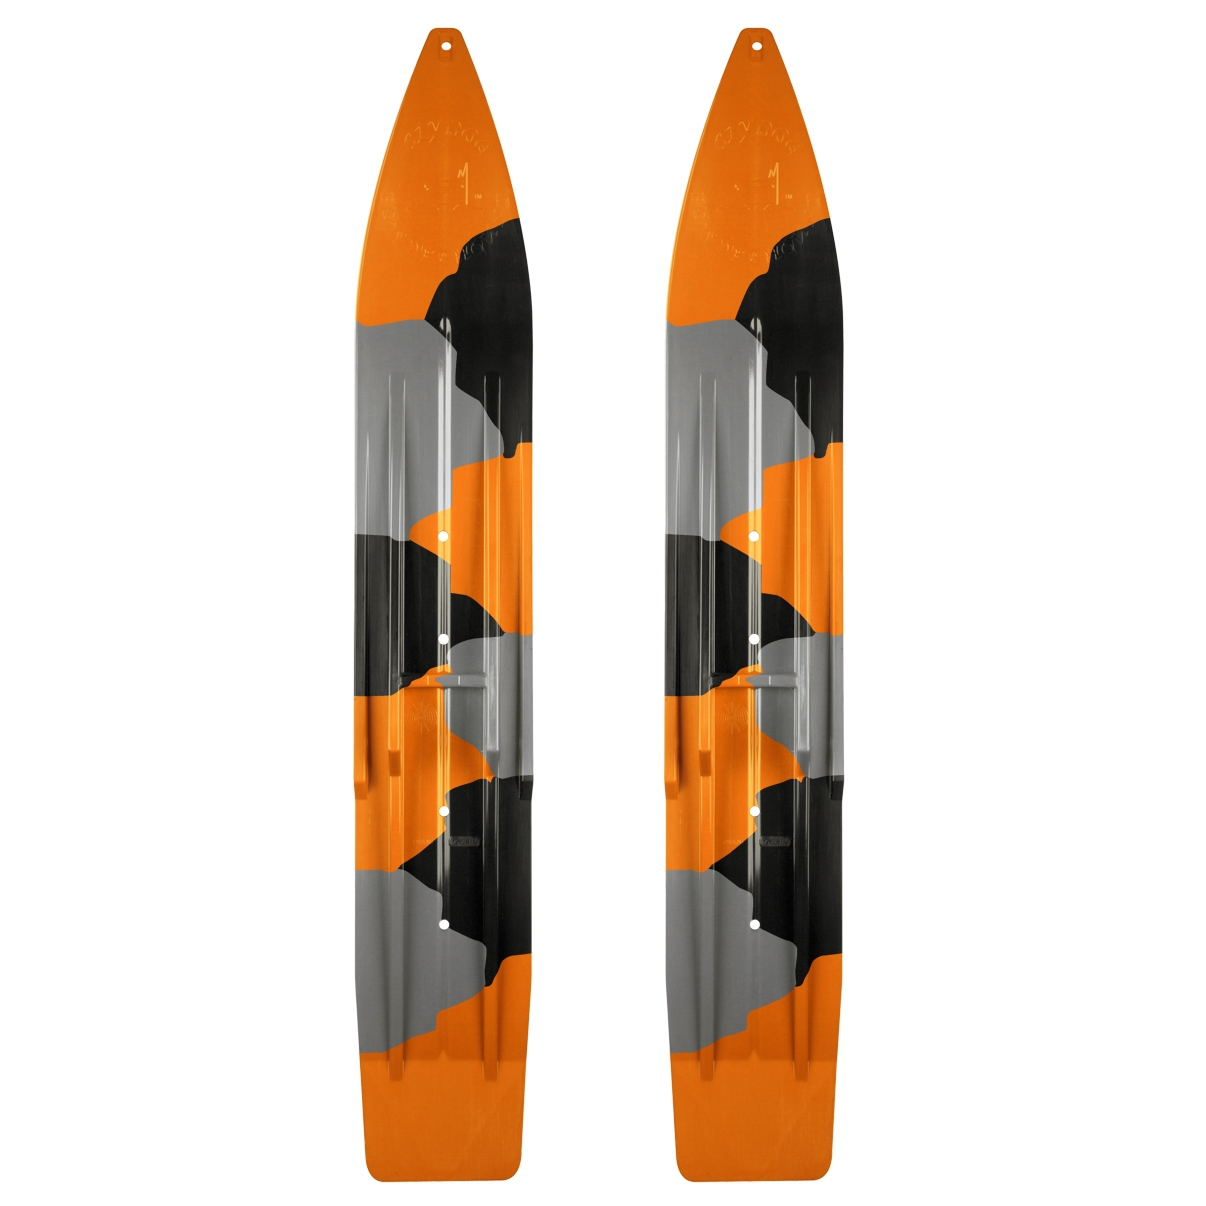 "SLYDOG SKIS 7"" Ski Powder Camo, Pair Camo, Orange, Black, Gray #310127 by SLYDOG SKIS"